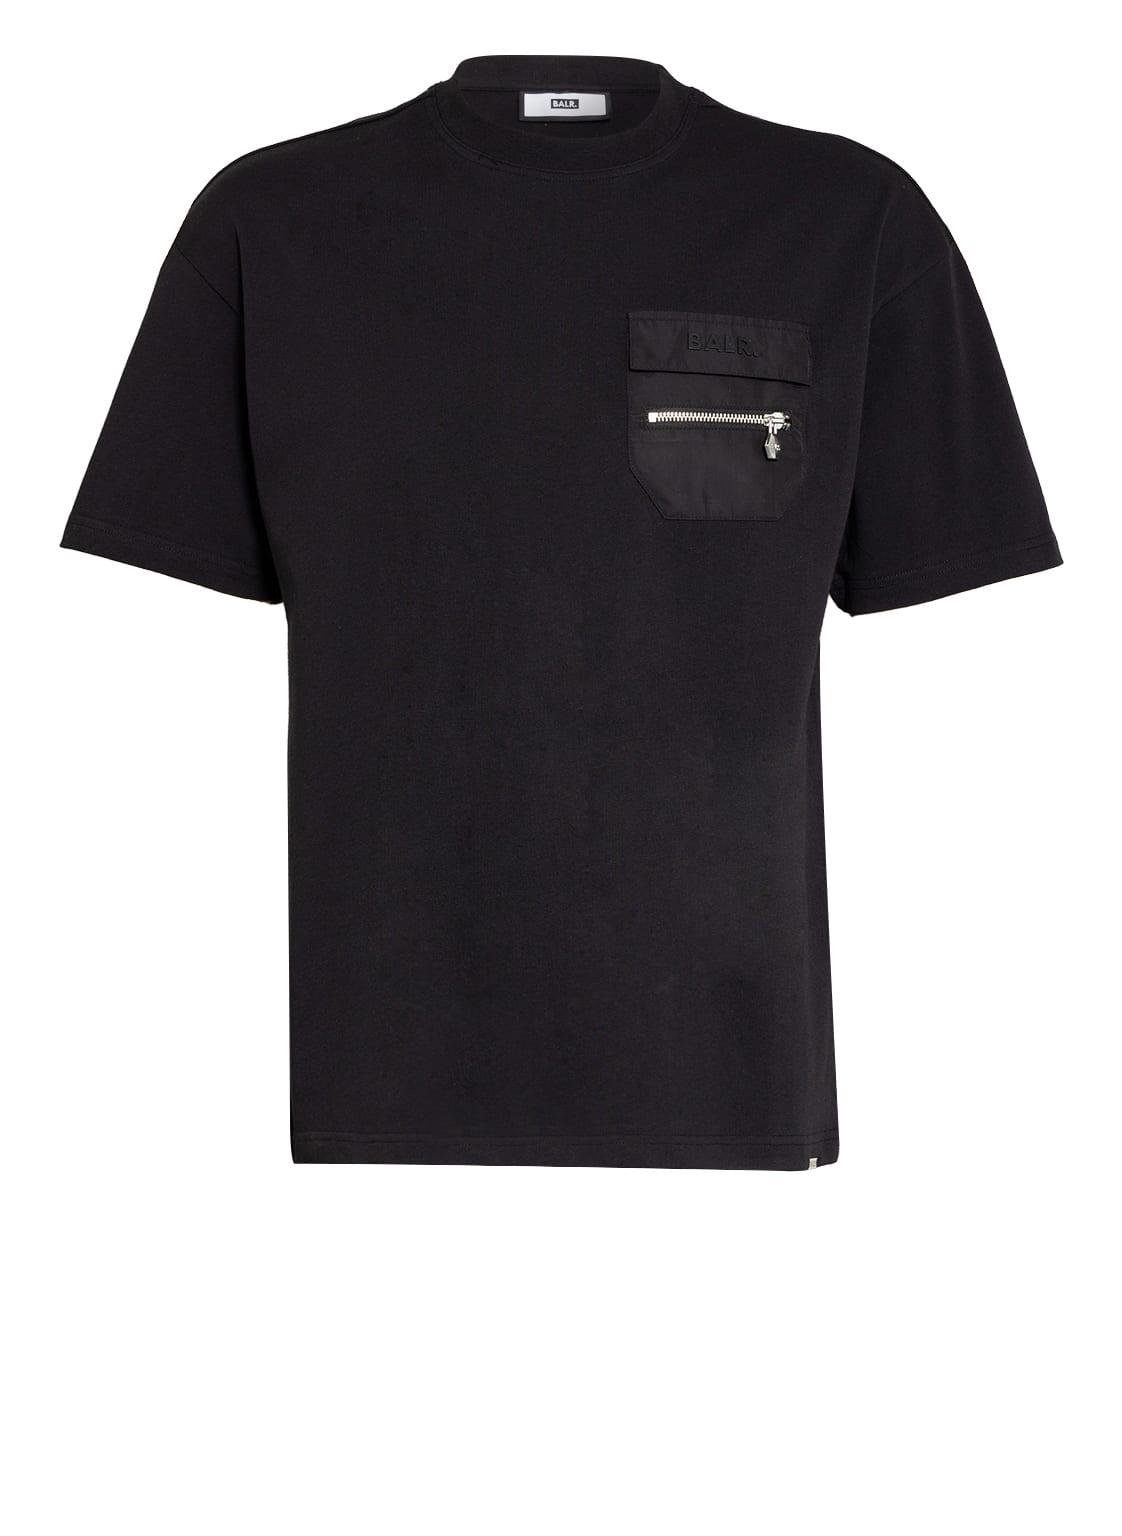 Image of Balr. T-Shirt schwarz